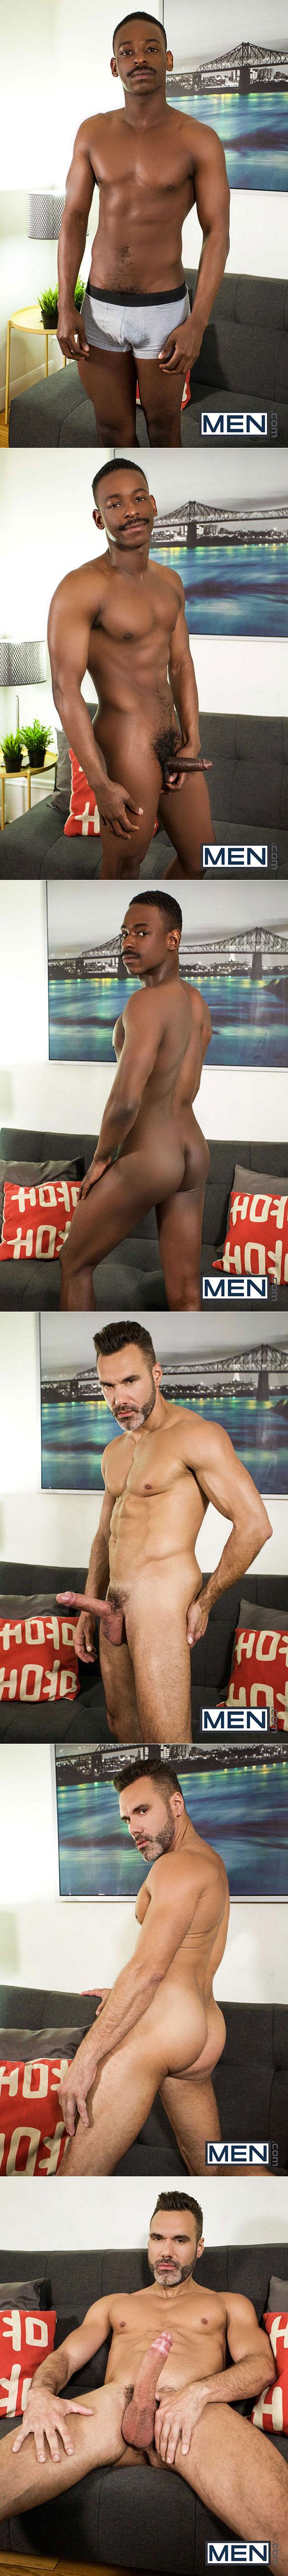 "Men.com: Manuel Skye pounds River Wilson in ""Get It In, Part 3"""